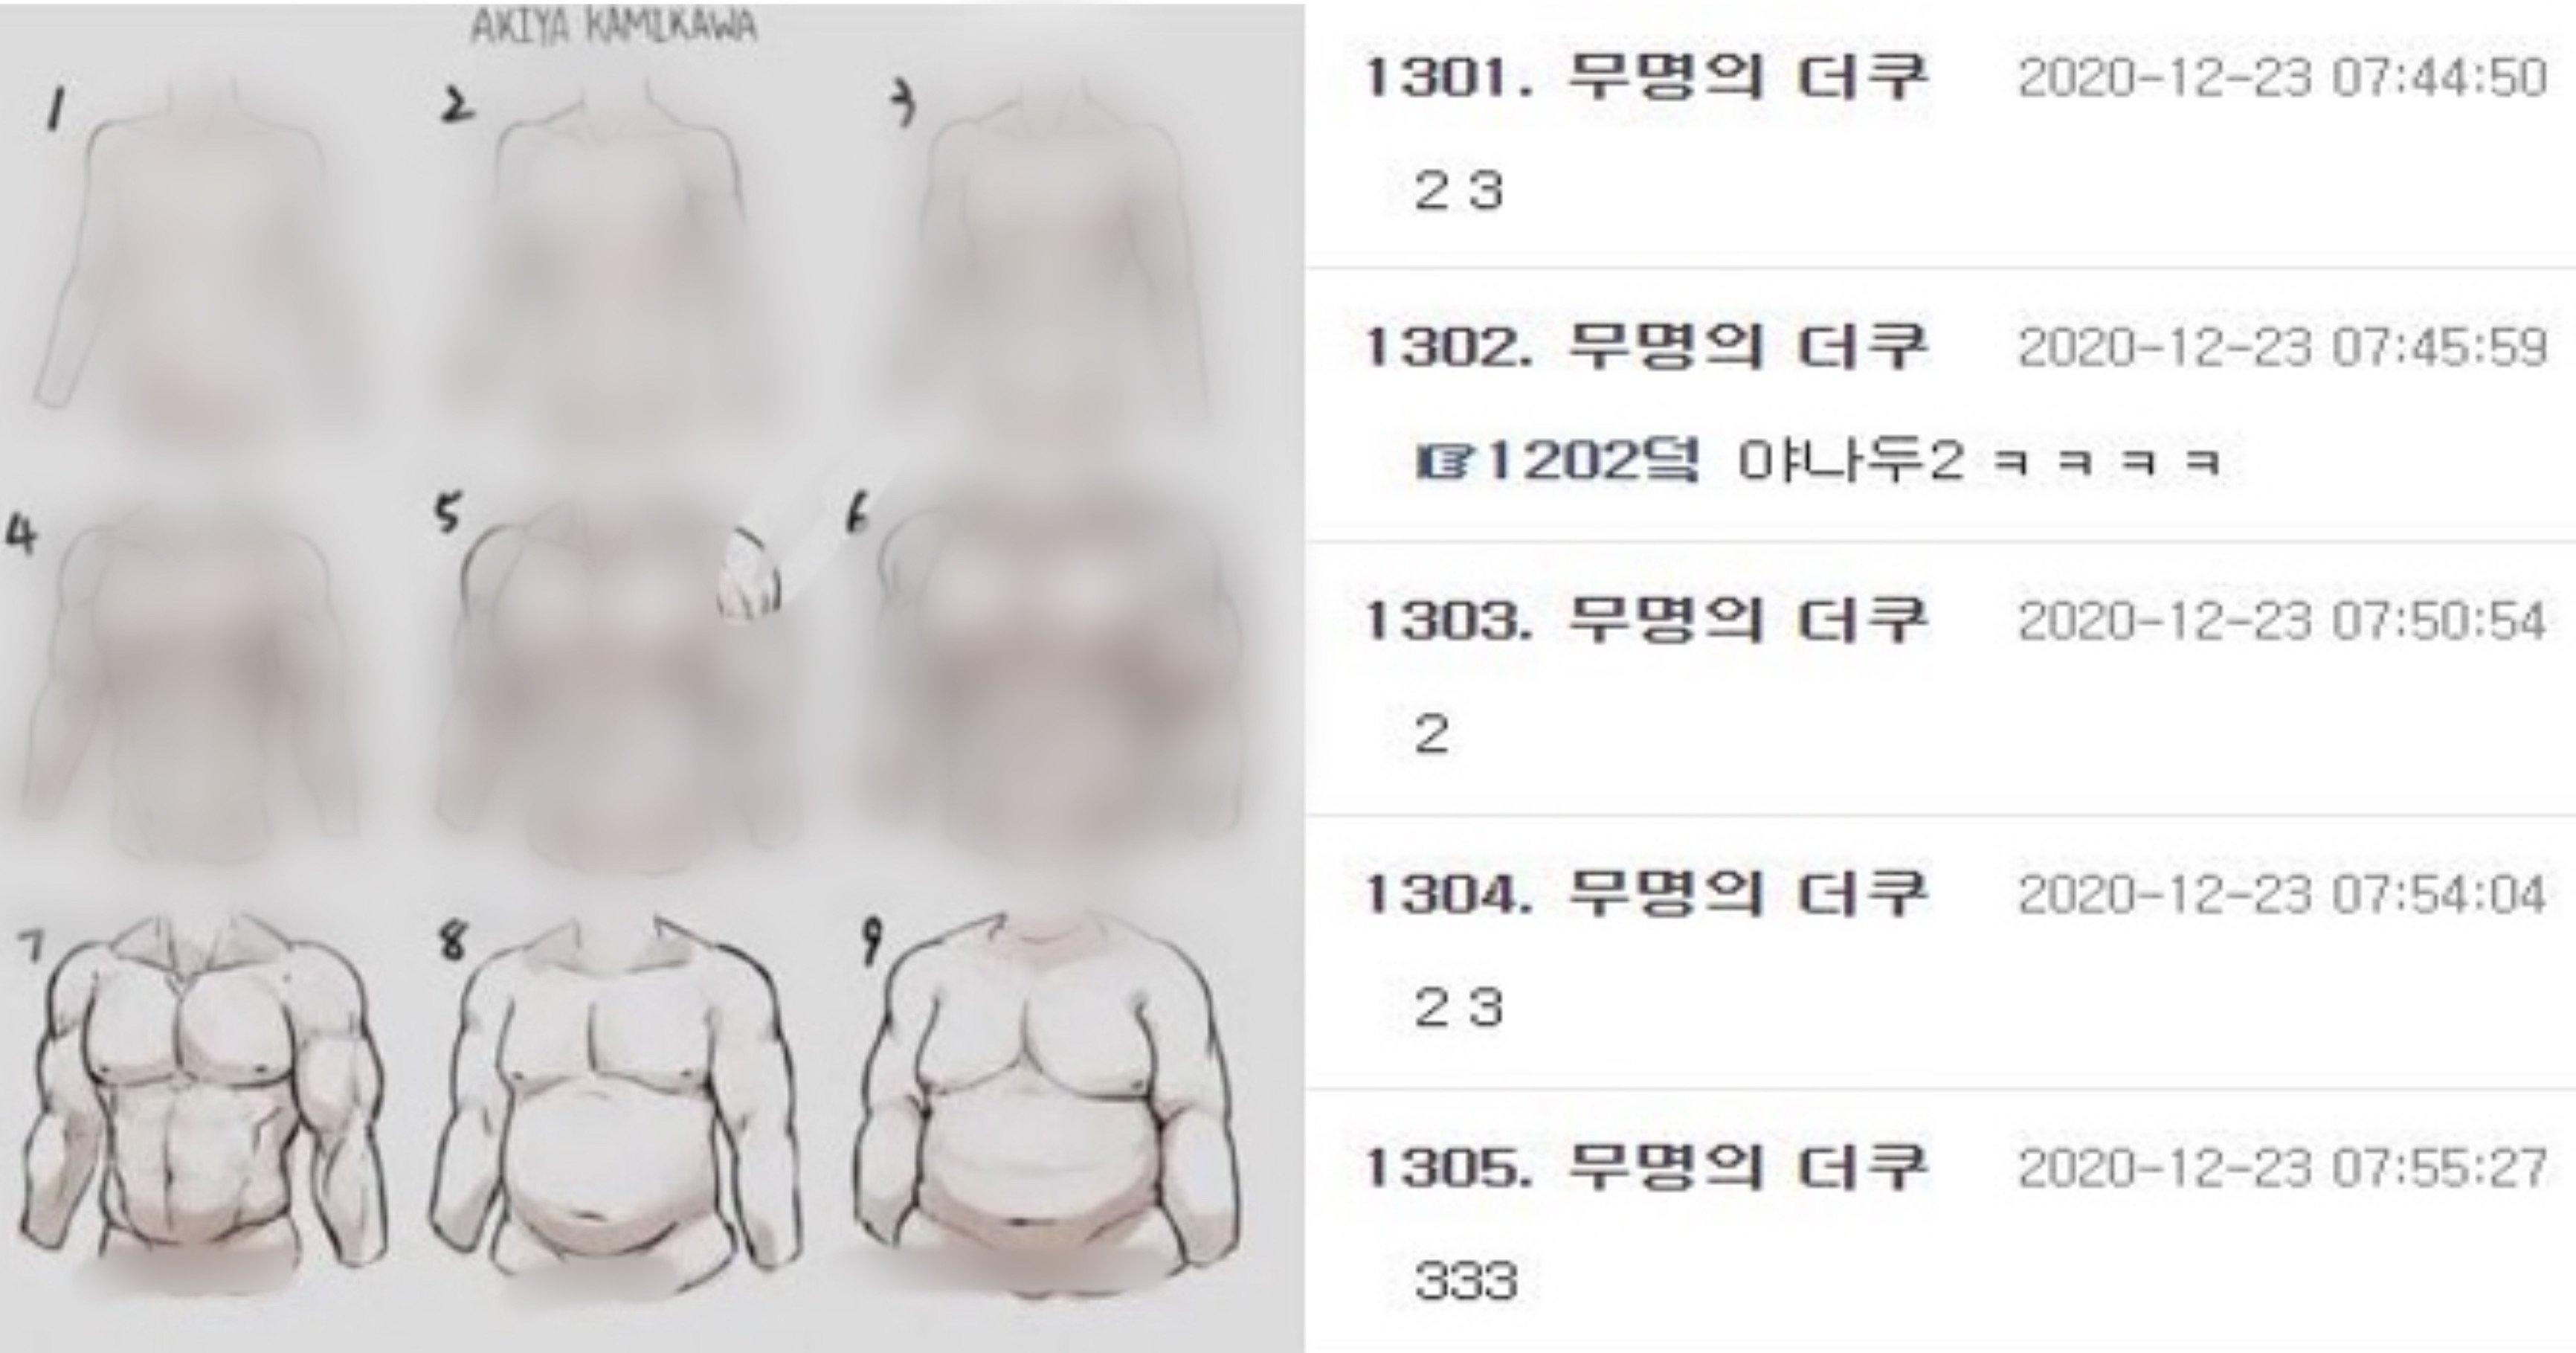 "8eb227d7 7a79 4749 95aa 58ccc3c3c524.jpeg?resize=412,232 - ""어떤 몸매의 남자와 사귈 건가요?"".. 라는 질문에 여성들의 가장 압도적이고 '충격적인' 선택"